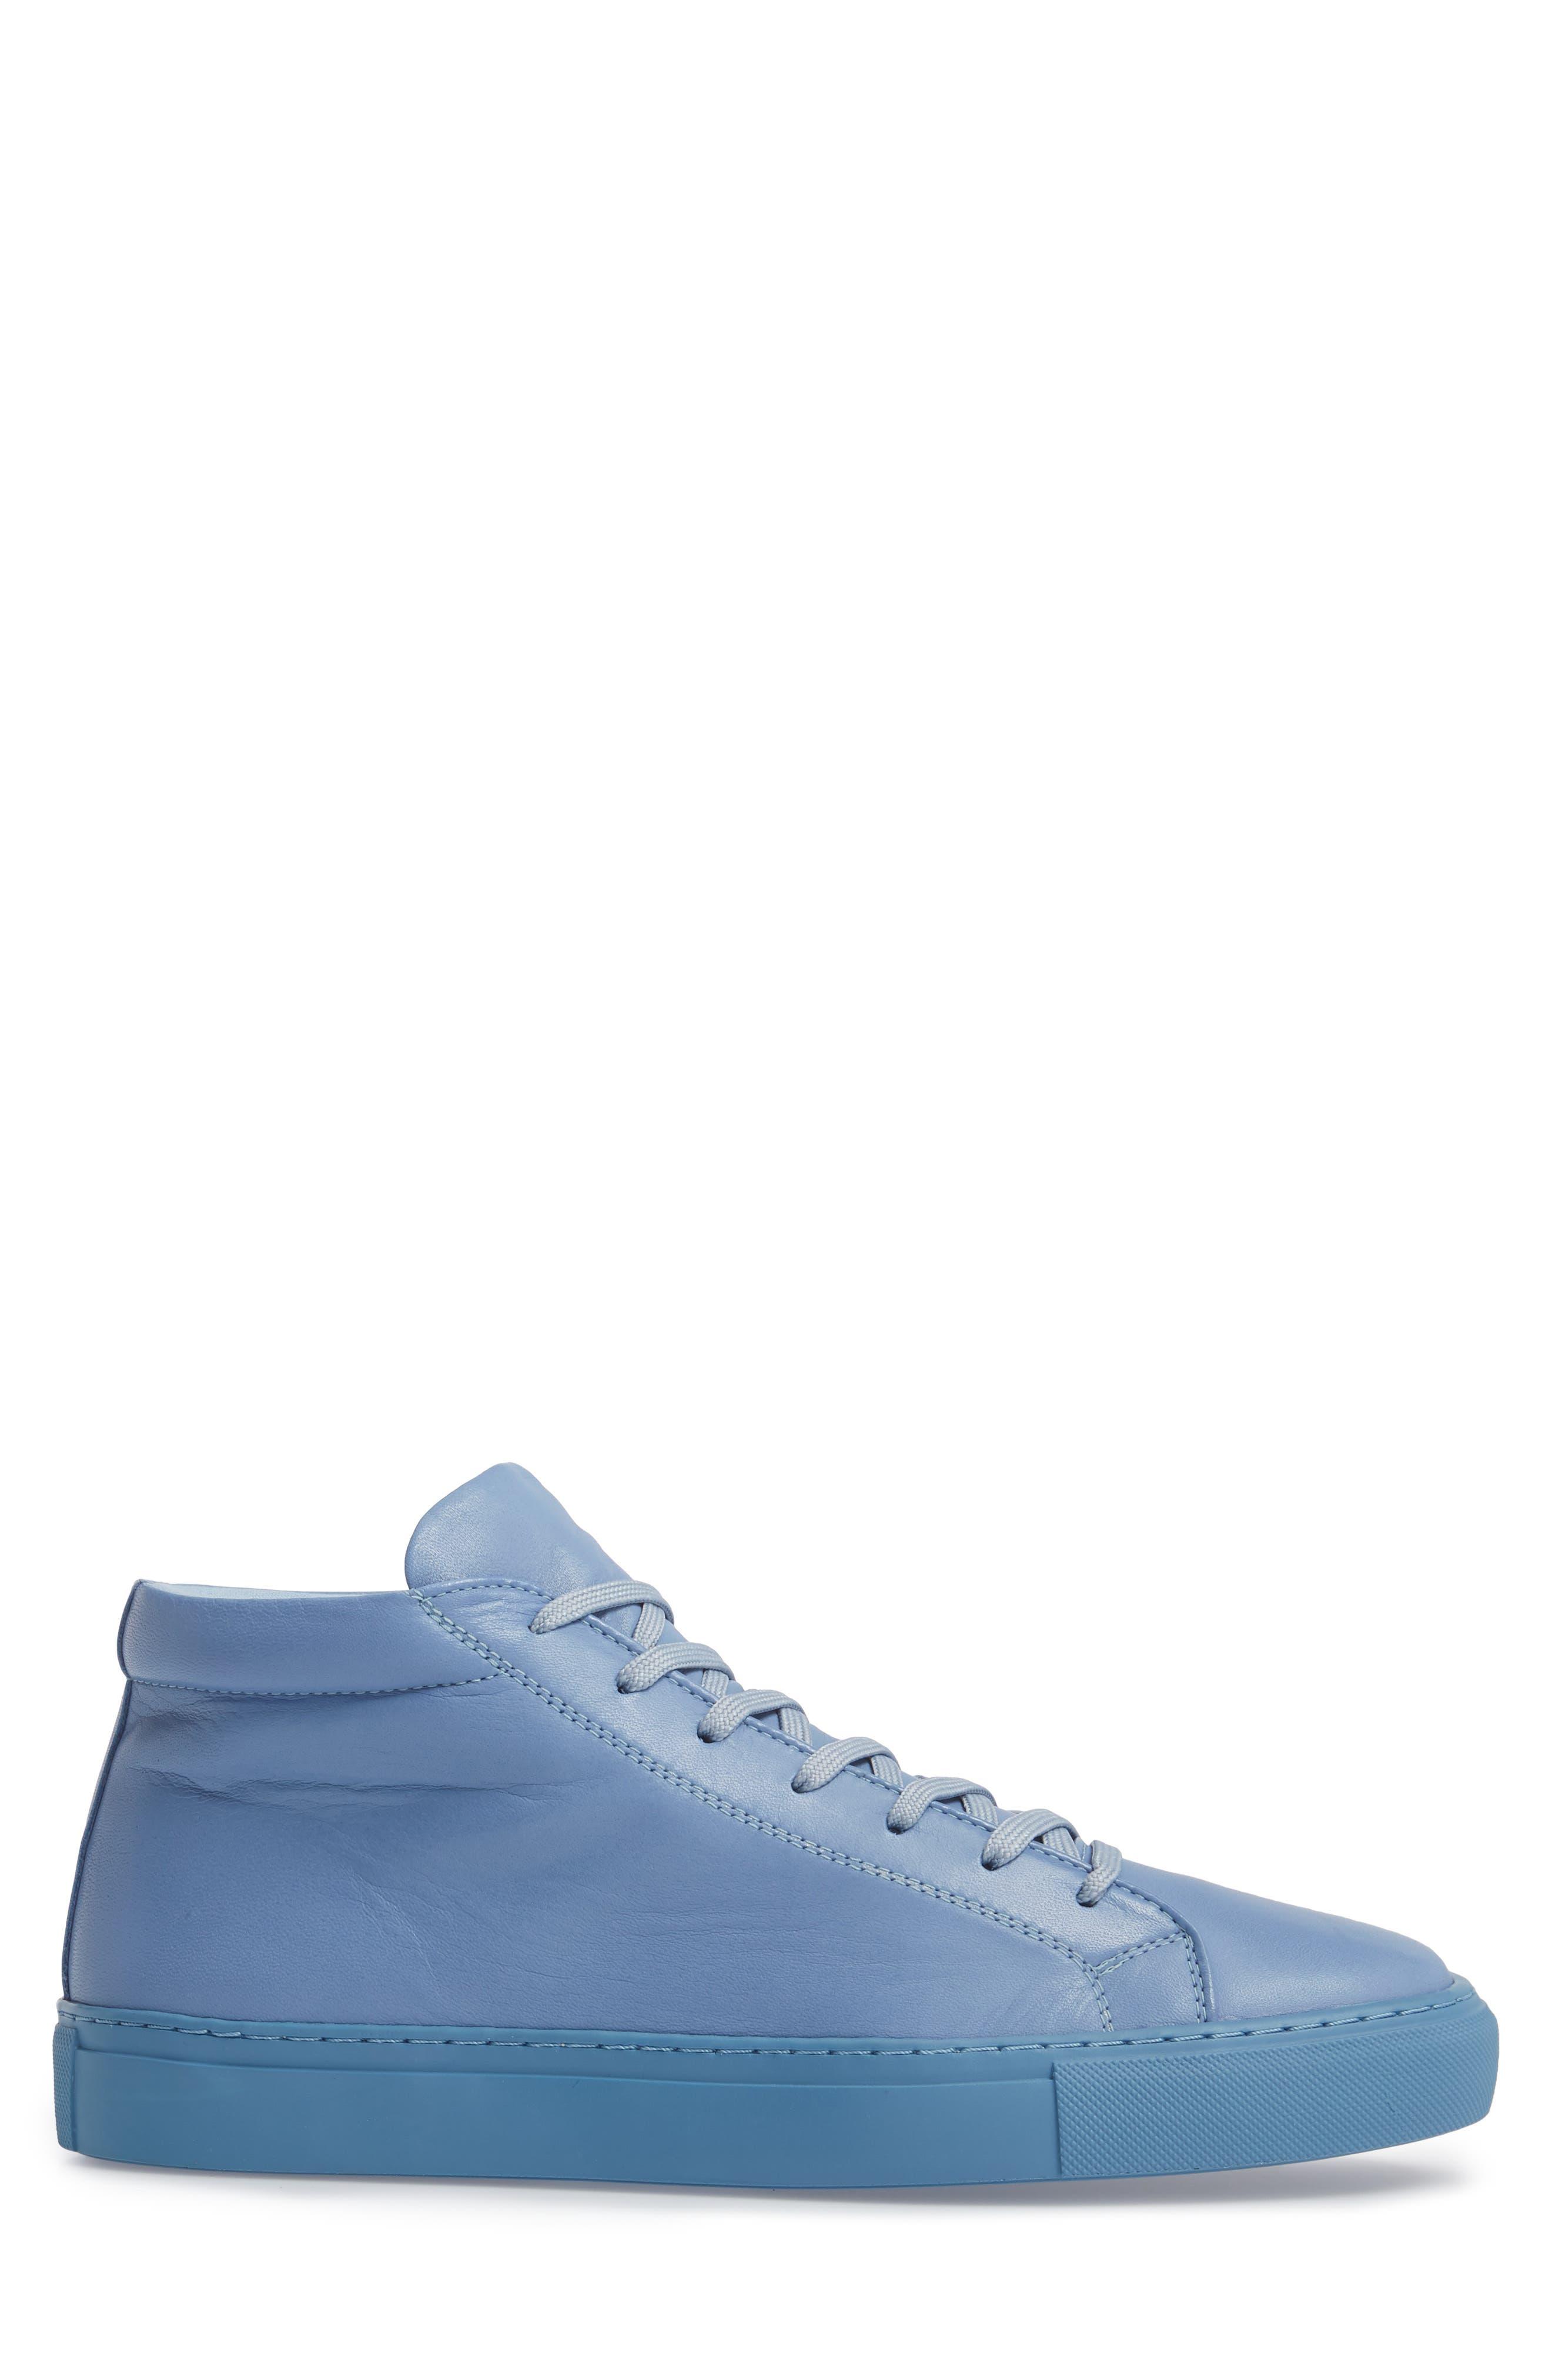 Lexington Mid Top Sneaker,                             Alternate thumbnail 8, color,